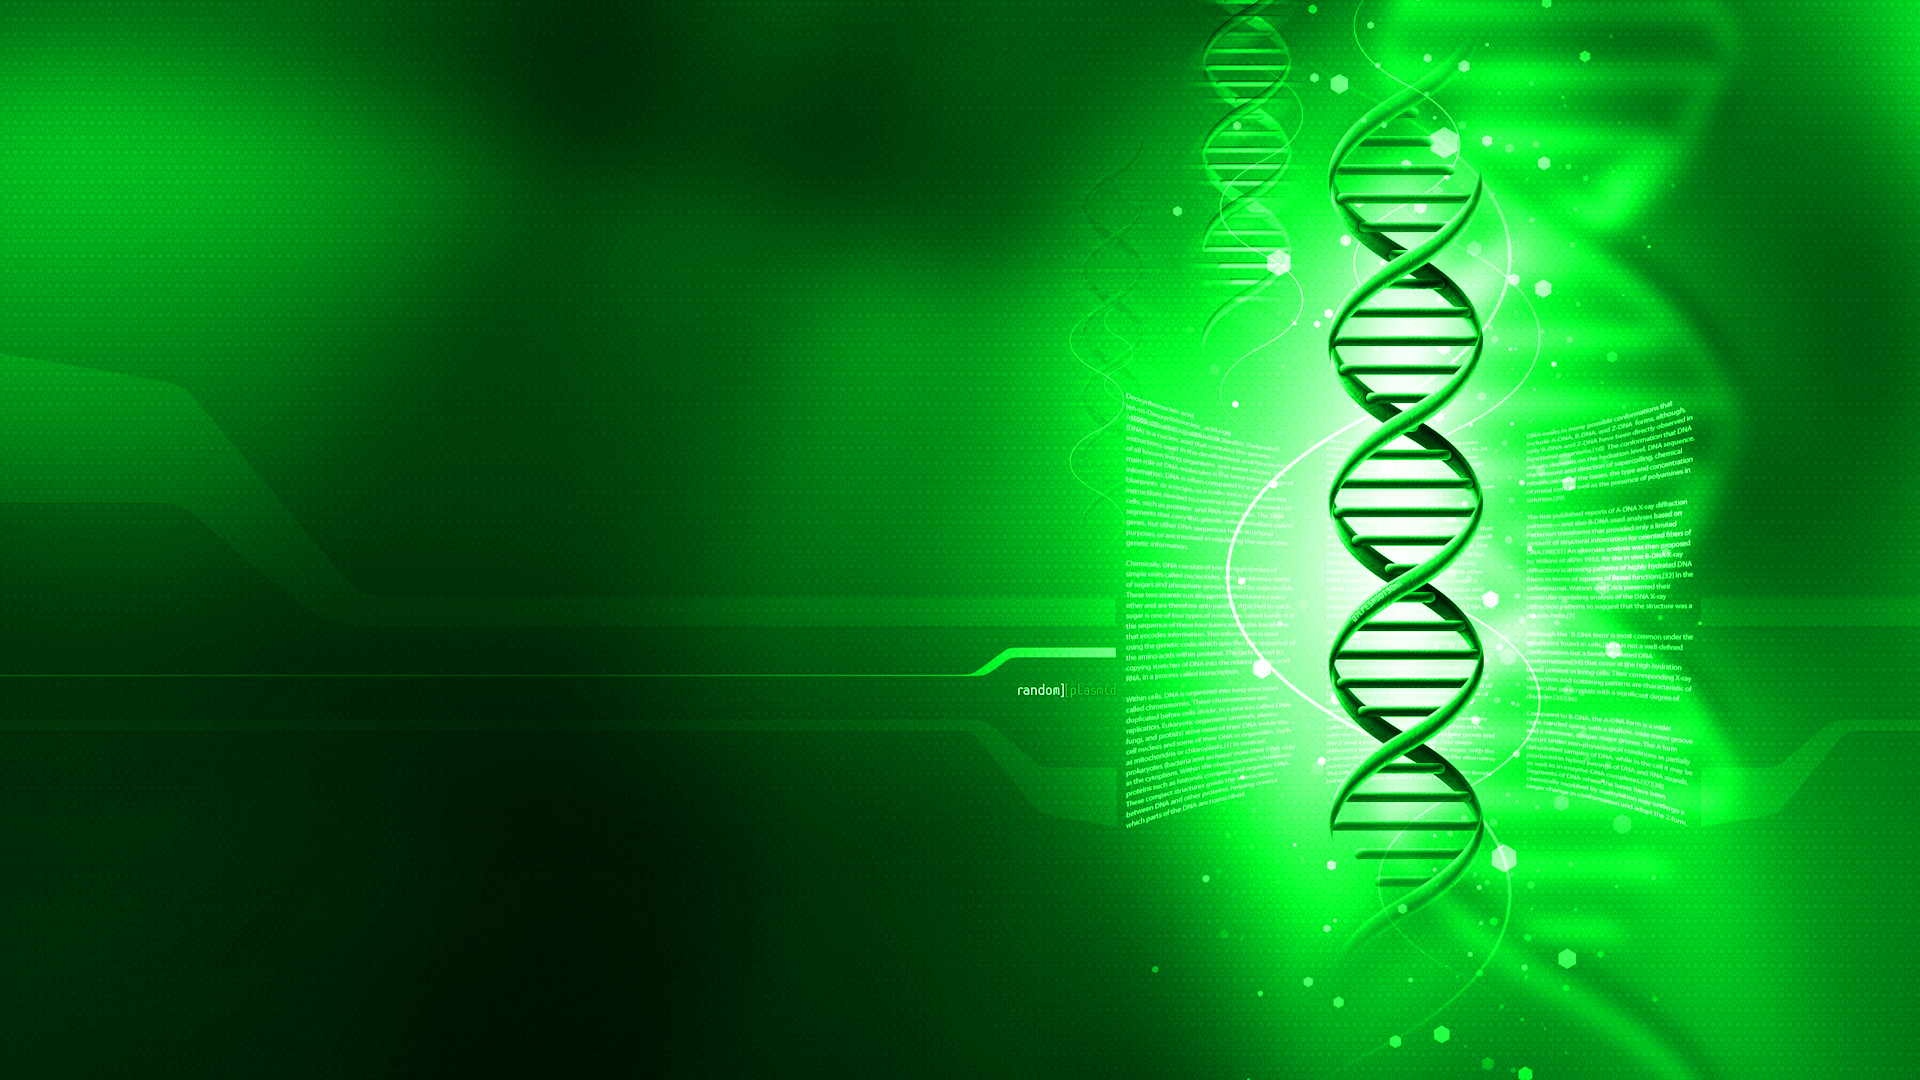 DNA Wallpaper 1920x1080 DNA 1920x1080